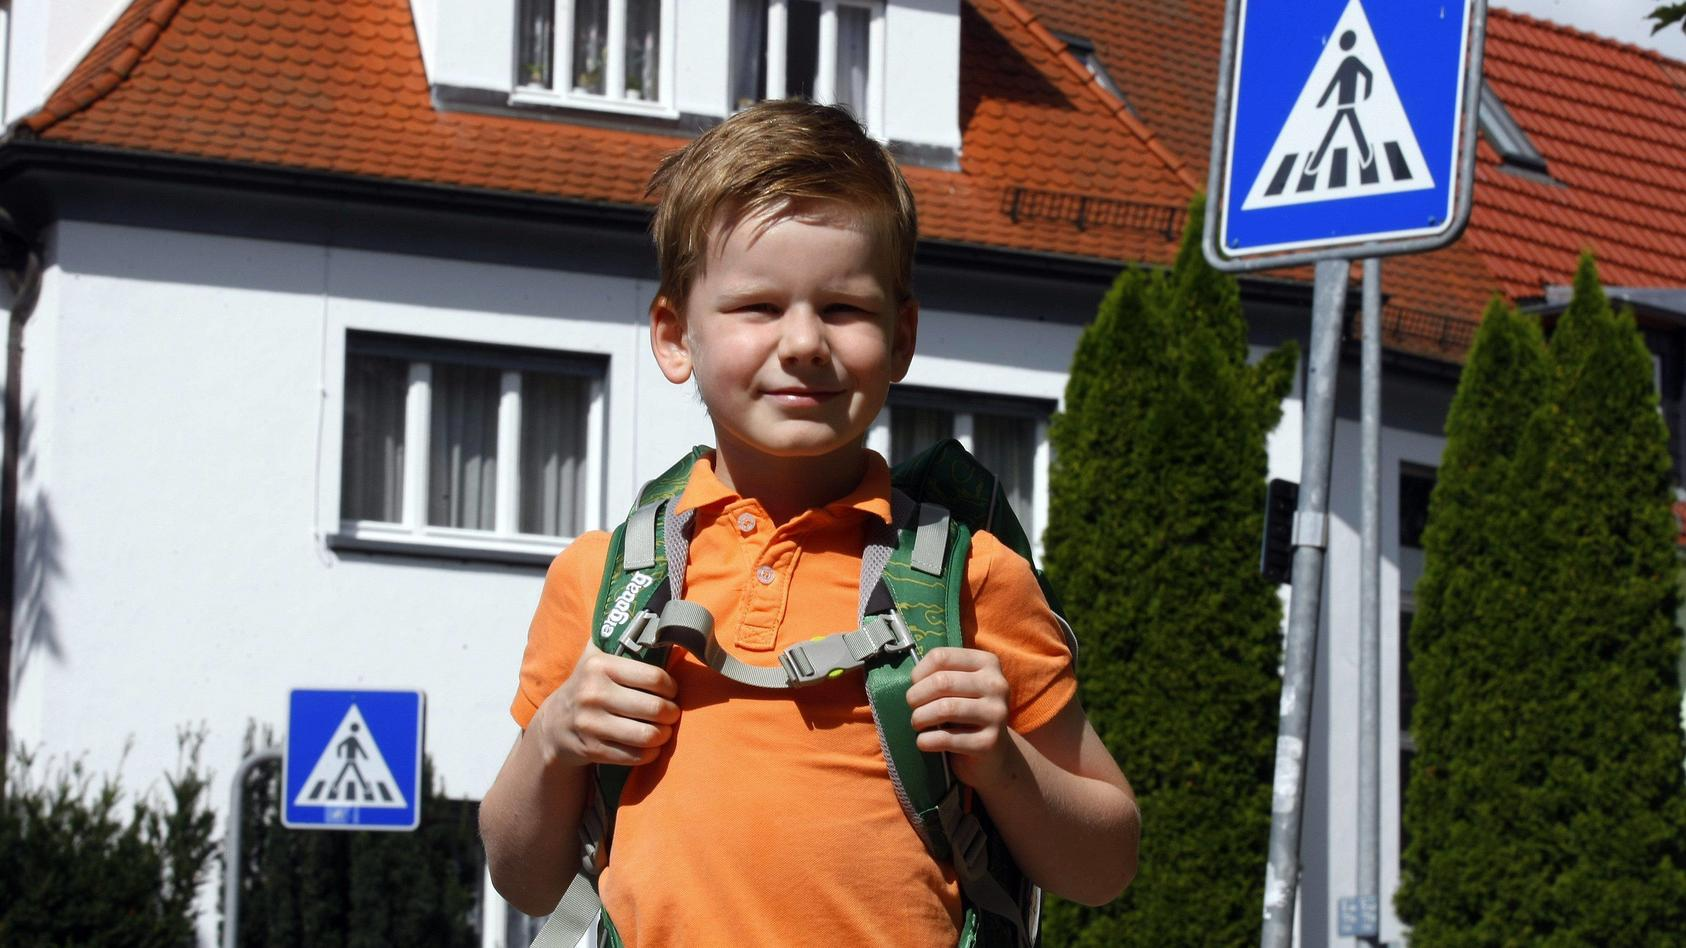 Erfurt 14 08 2014 Henry kommt im September zur Schule in die Erste Klasse Den Schulweg hat er vorh